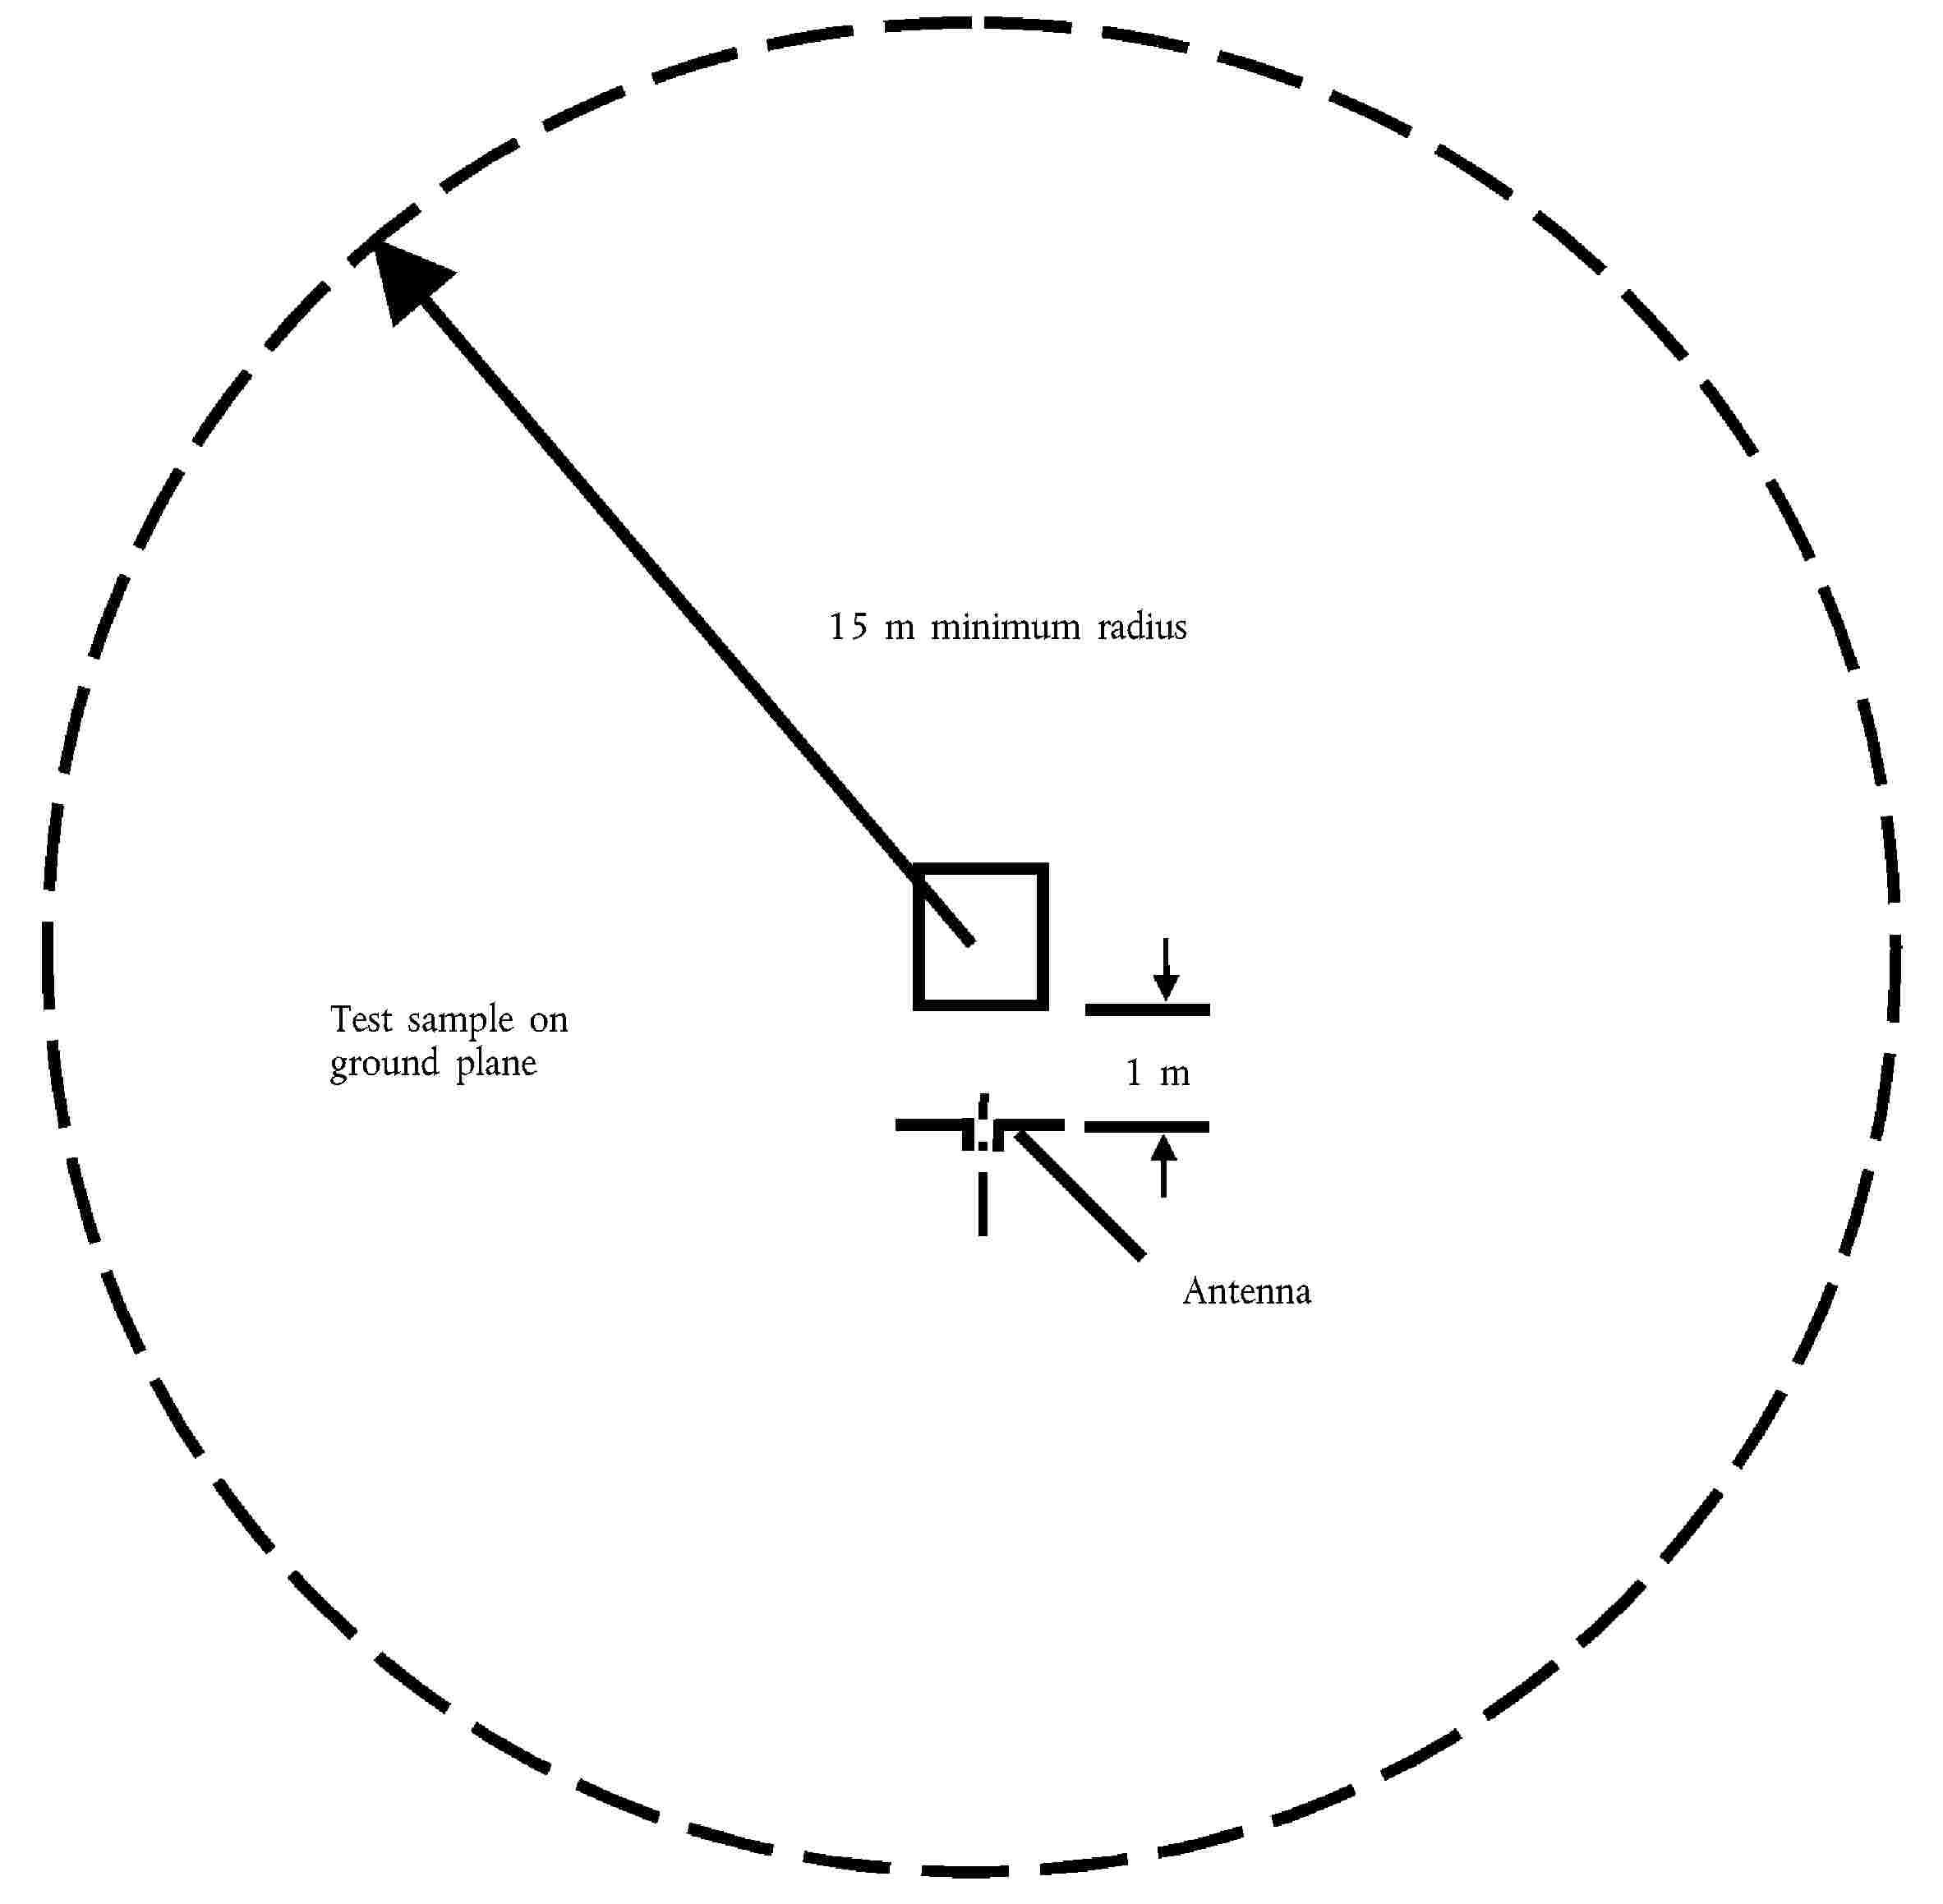 Eur Lex 01972l0245 20060327 En Power Supply Positivenegativeground From A Single 15 M Minimum Radiustest Sample On Ground Plane1 Mantenna